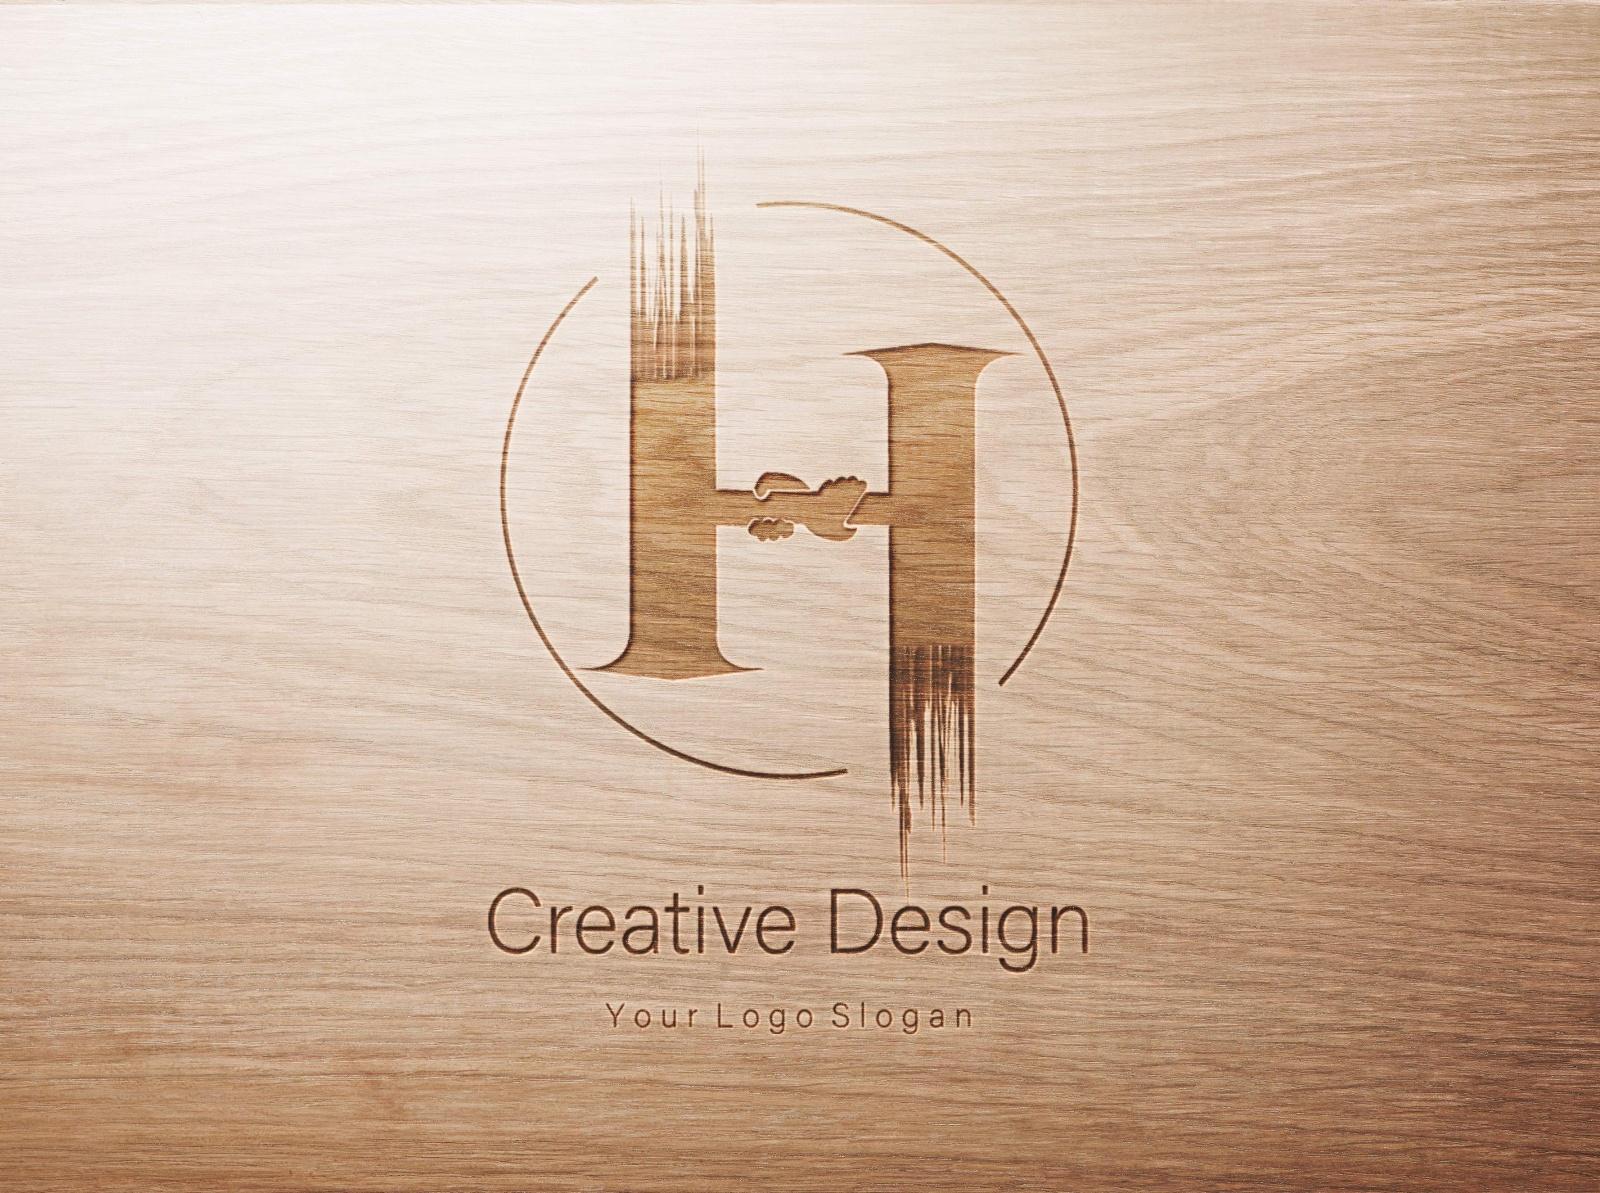 Logo Design H & hand. by Md. Yasin Khan on Dribbble.